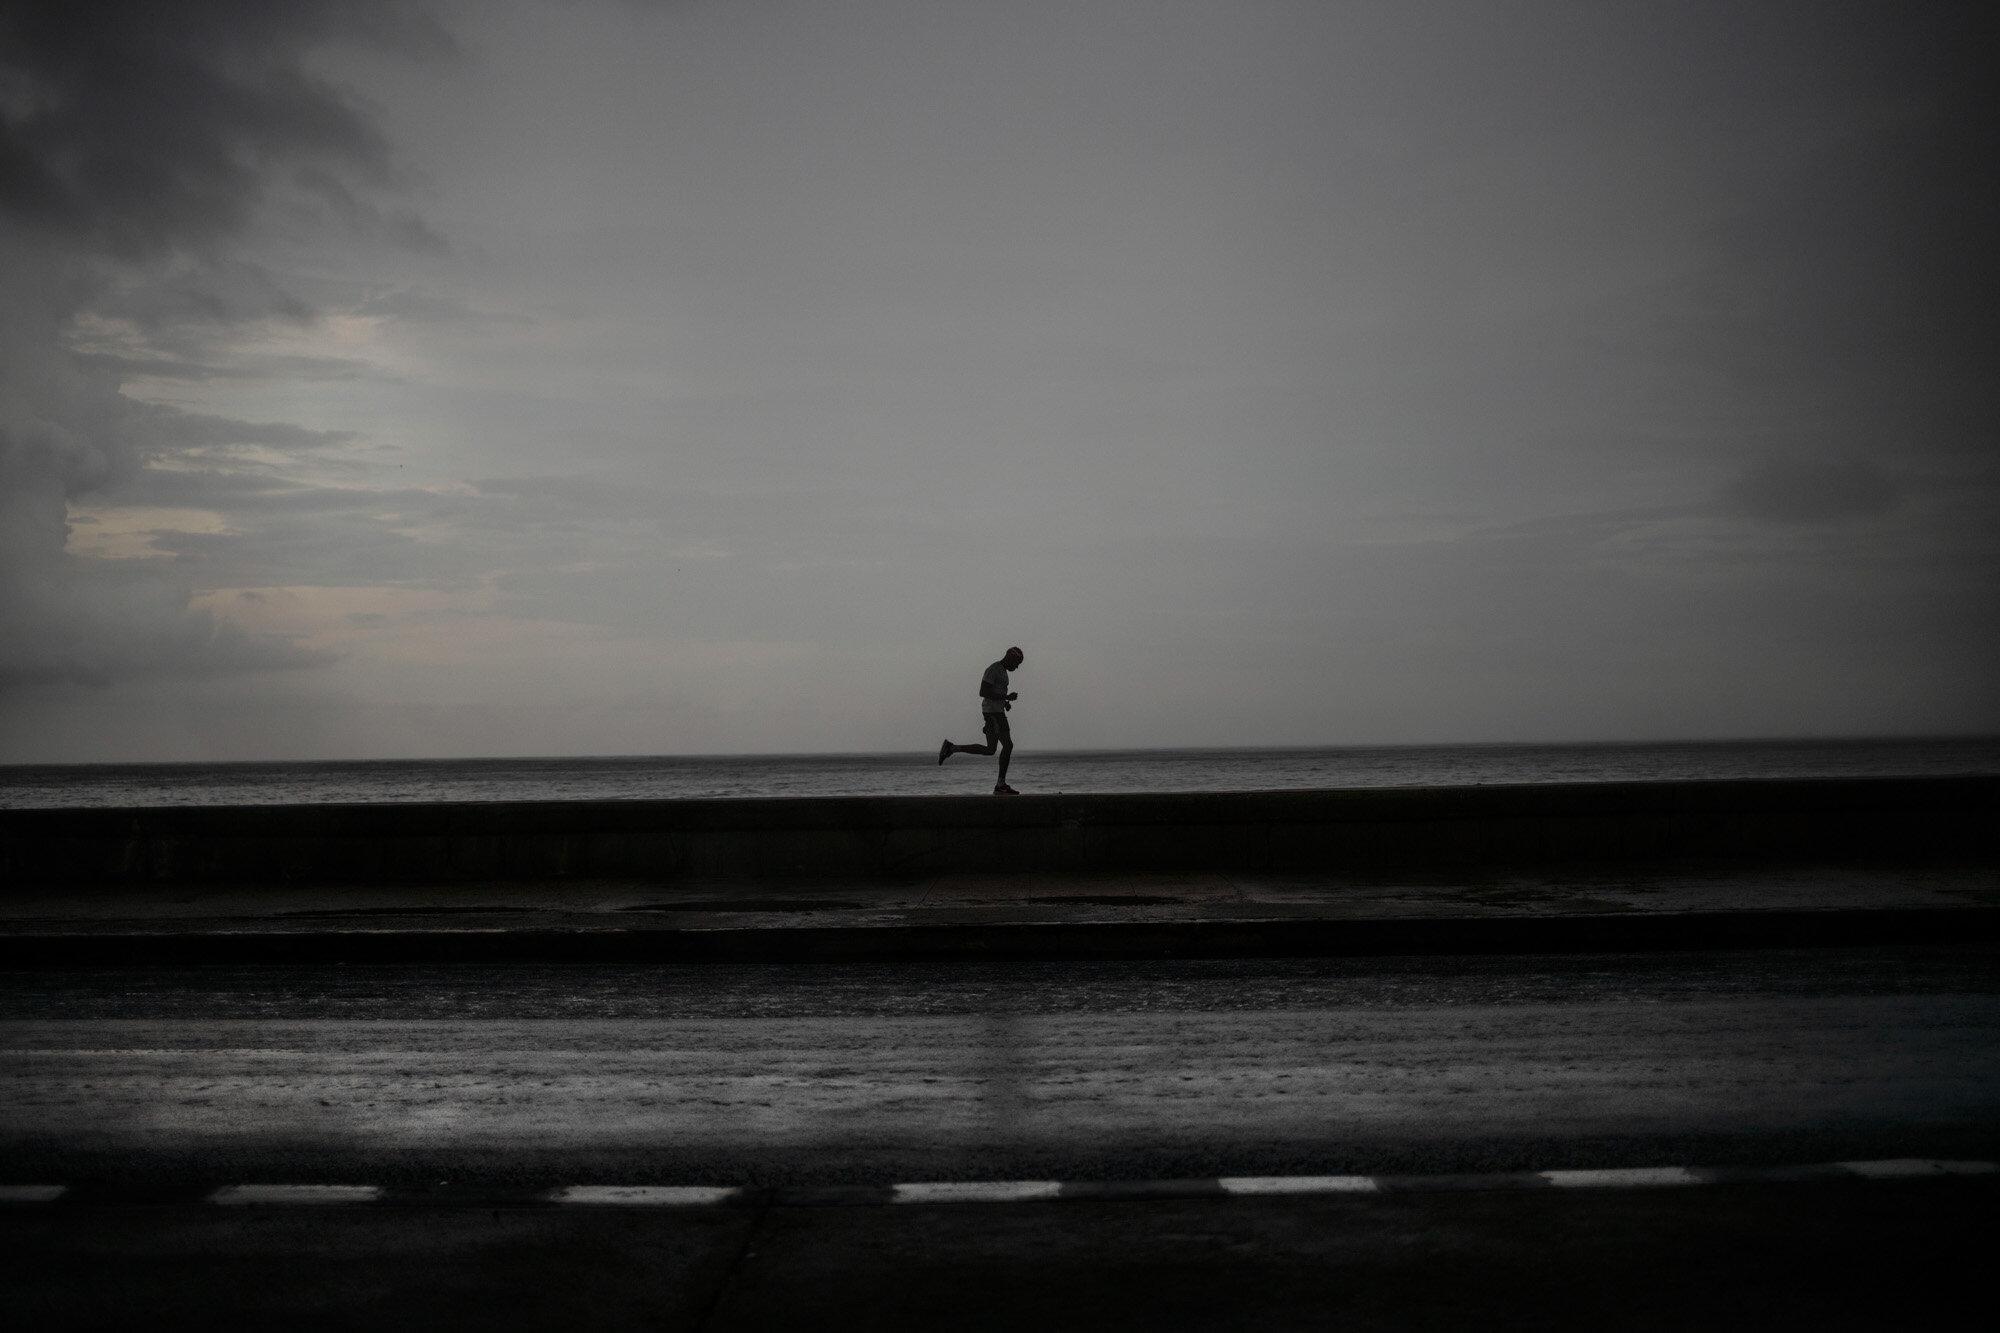 A man wearing a face mask as a precaution against the spread of the coronavirus runs along the Malecon seawall under the rain in Havana, Cuba, on Oct. 6, 2020. (AP Photo/Ramon Espinosa)